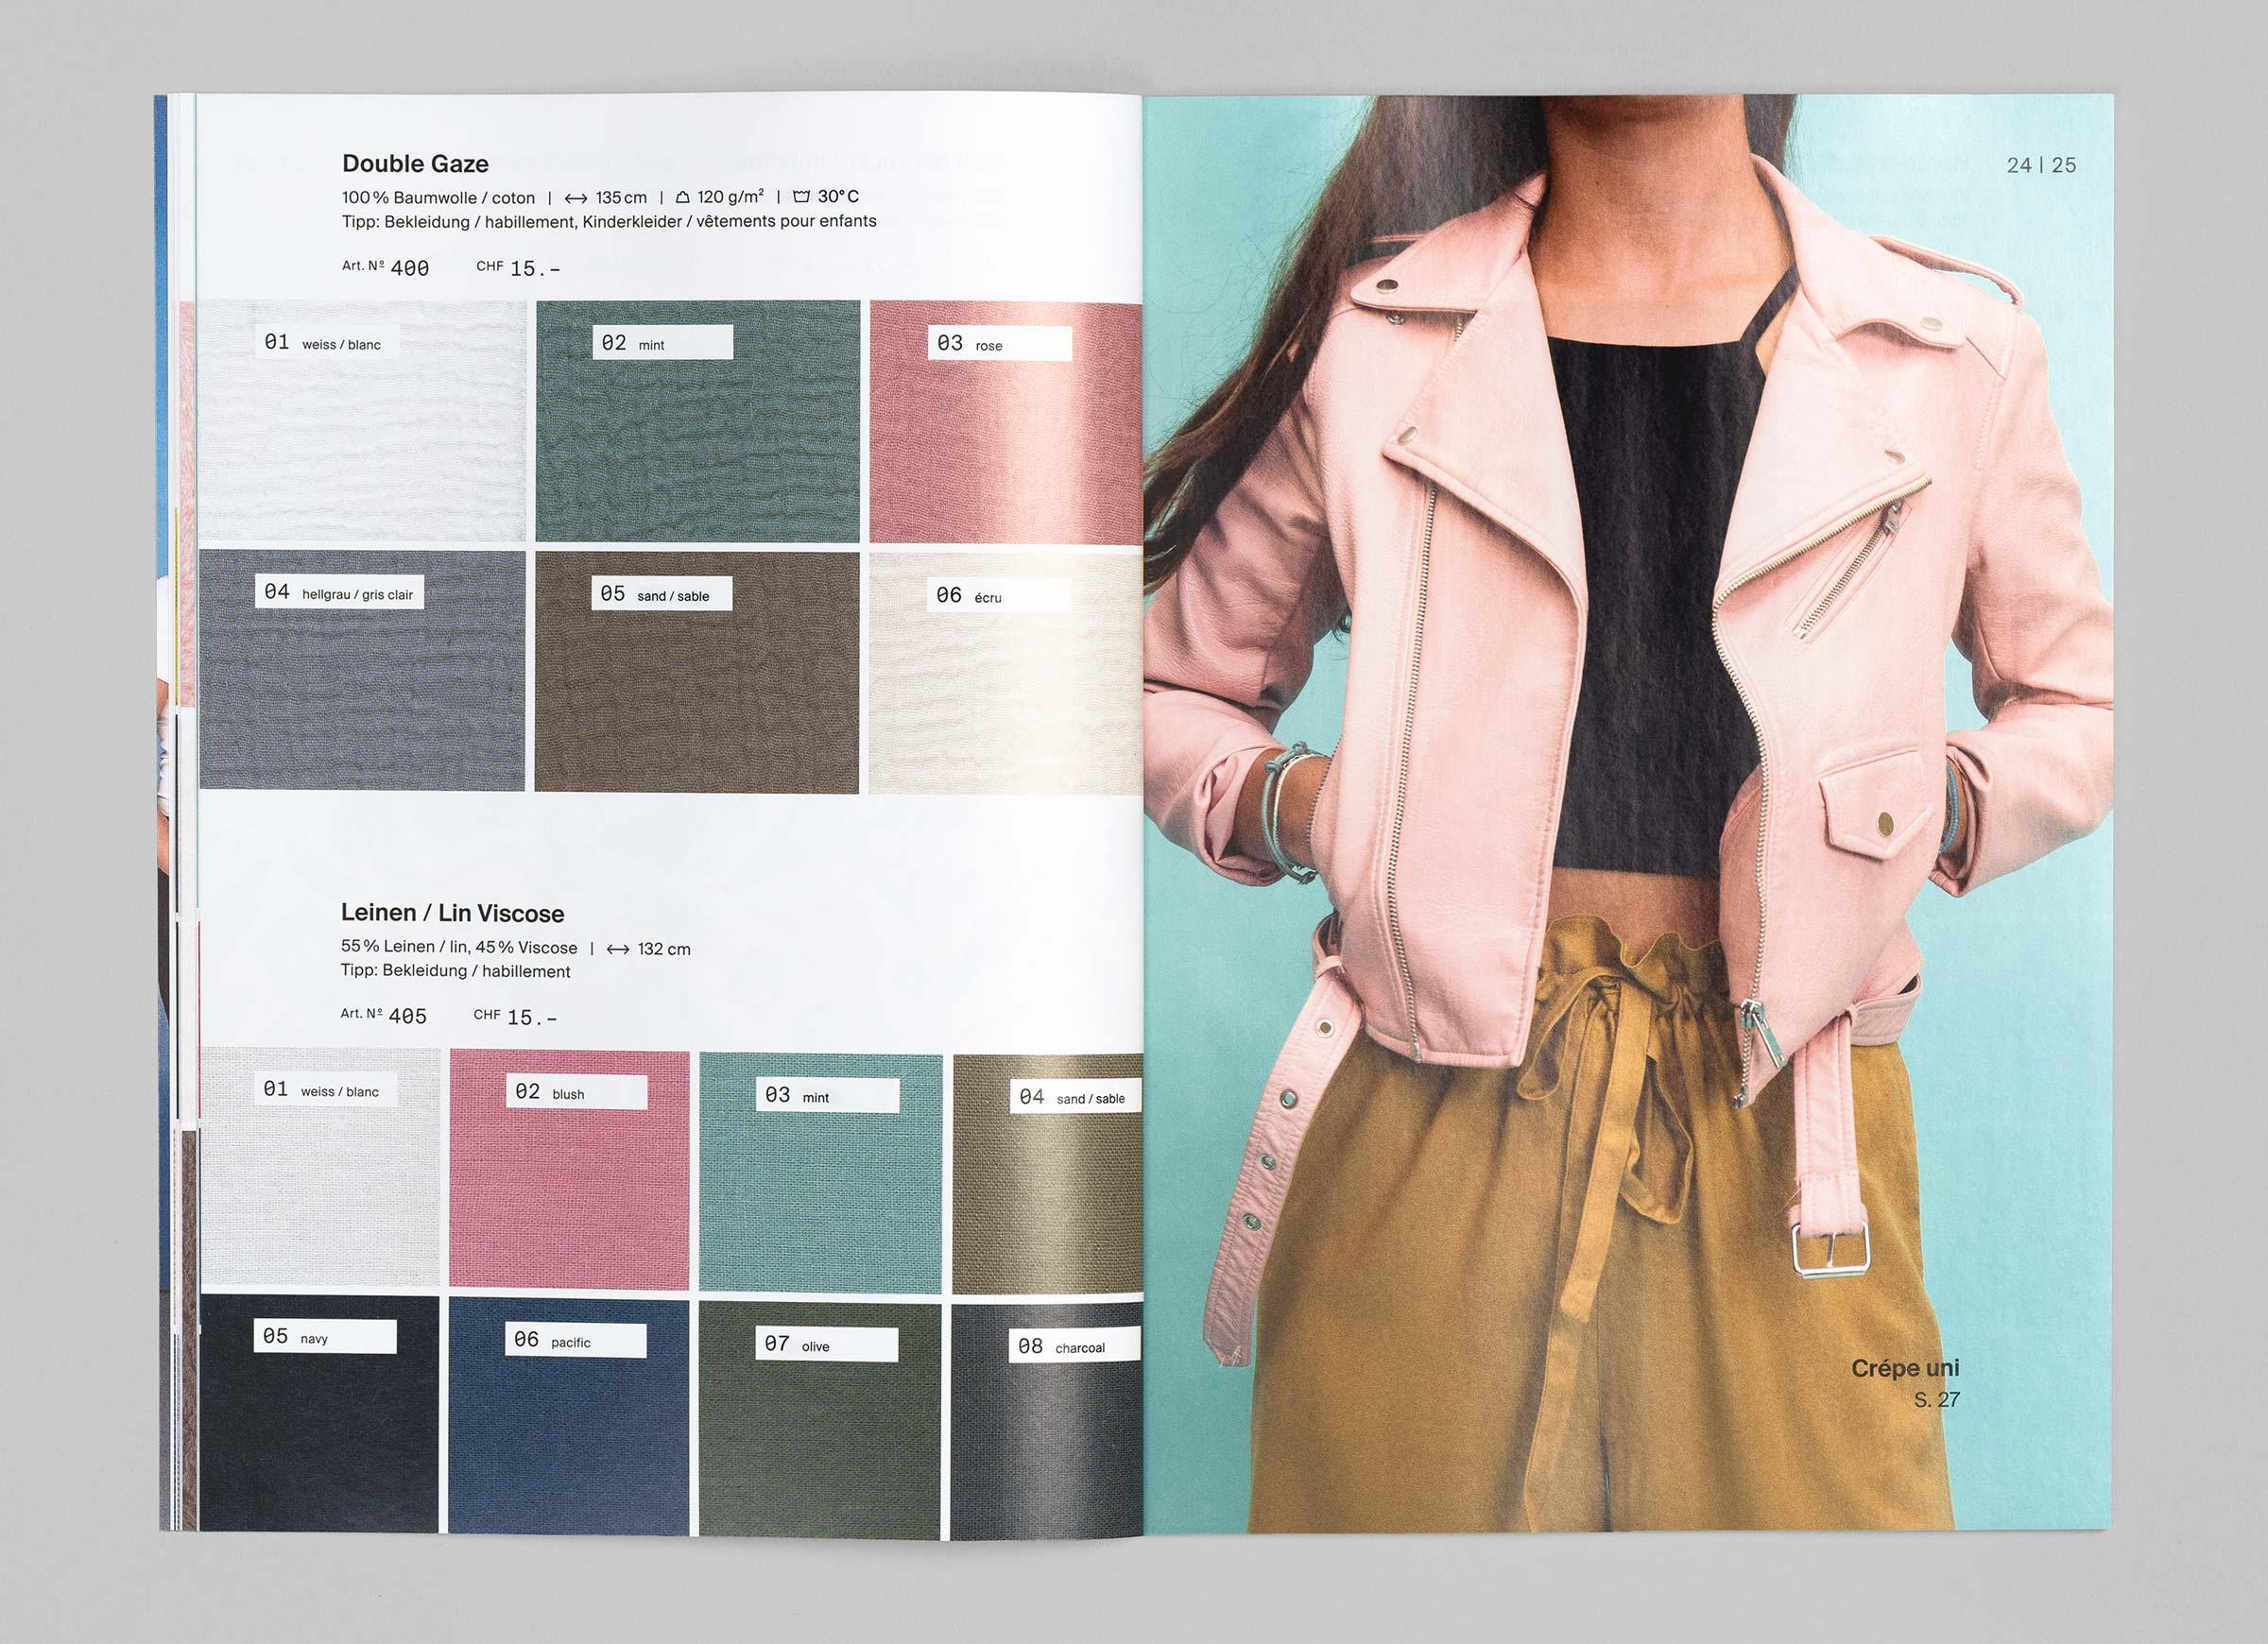 Textil Tricot Vogt – Katalog 2017/18, spreads ©Atelier Pol × Barbara Hess